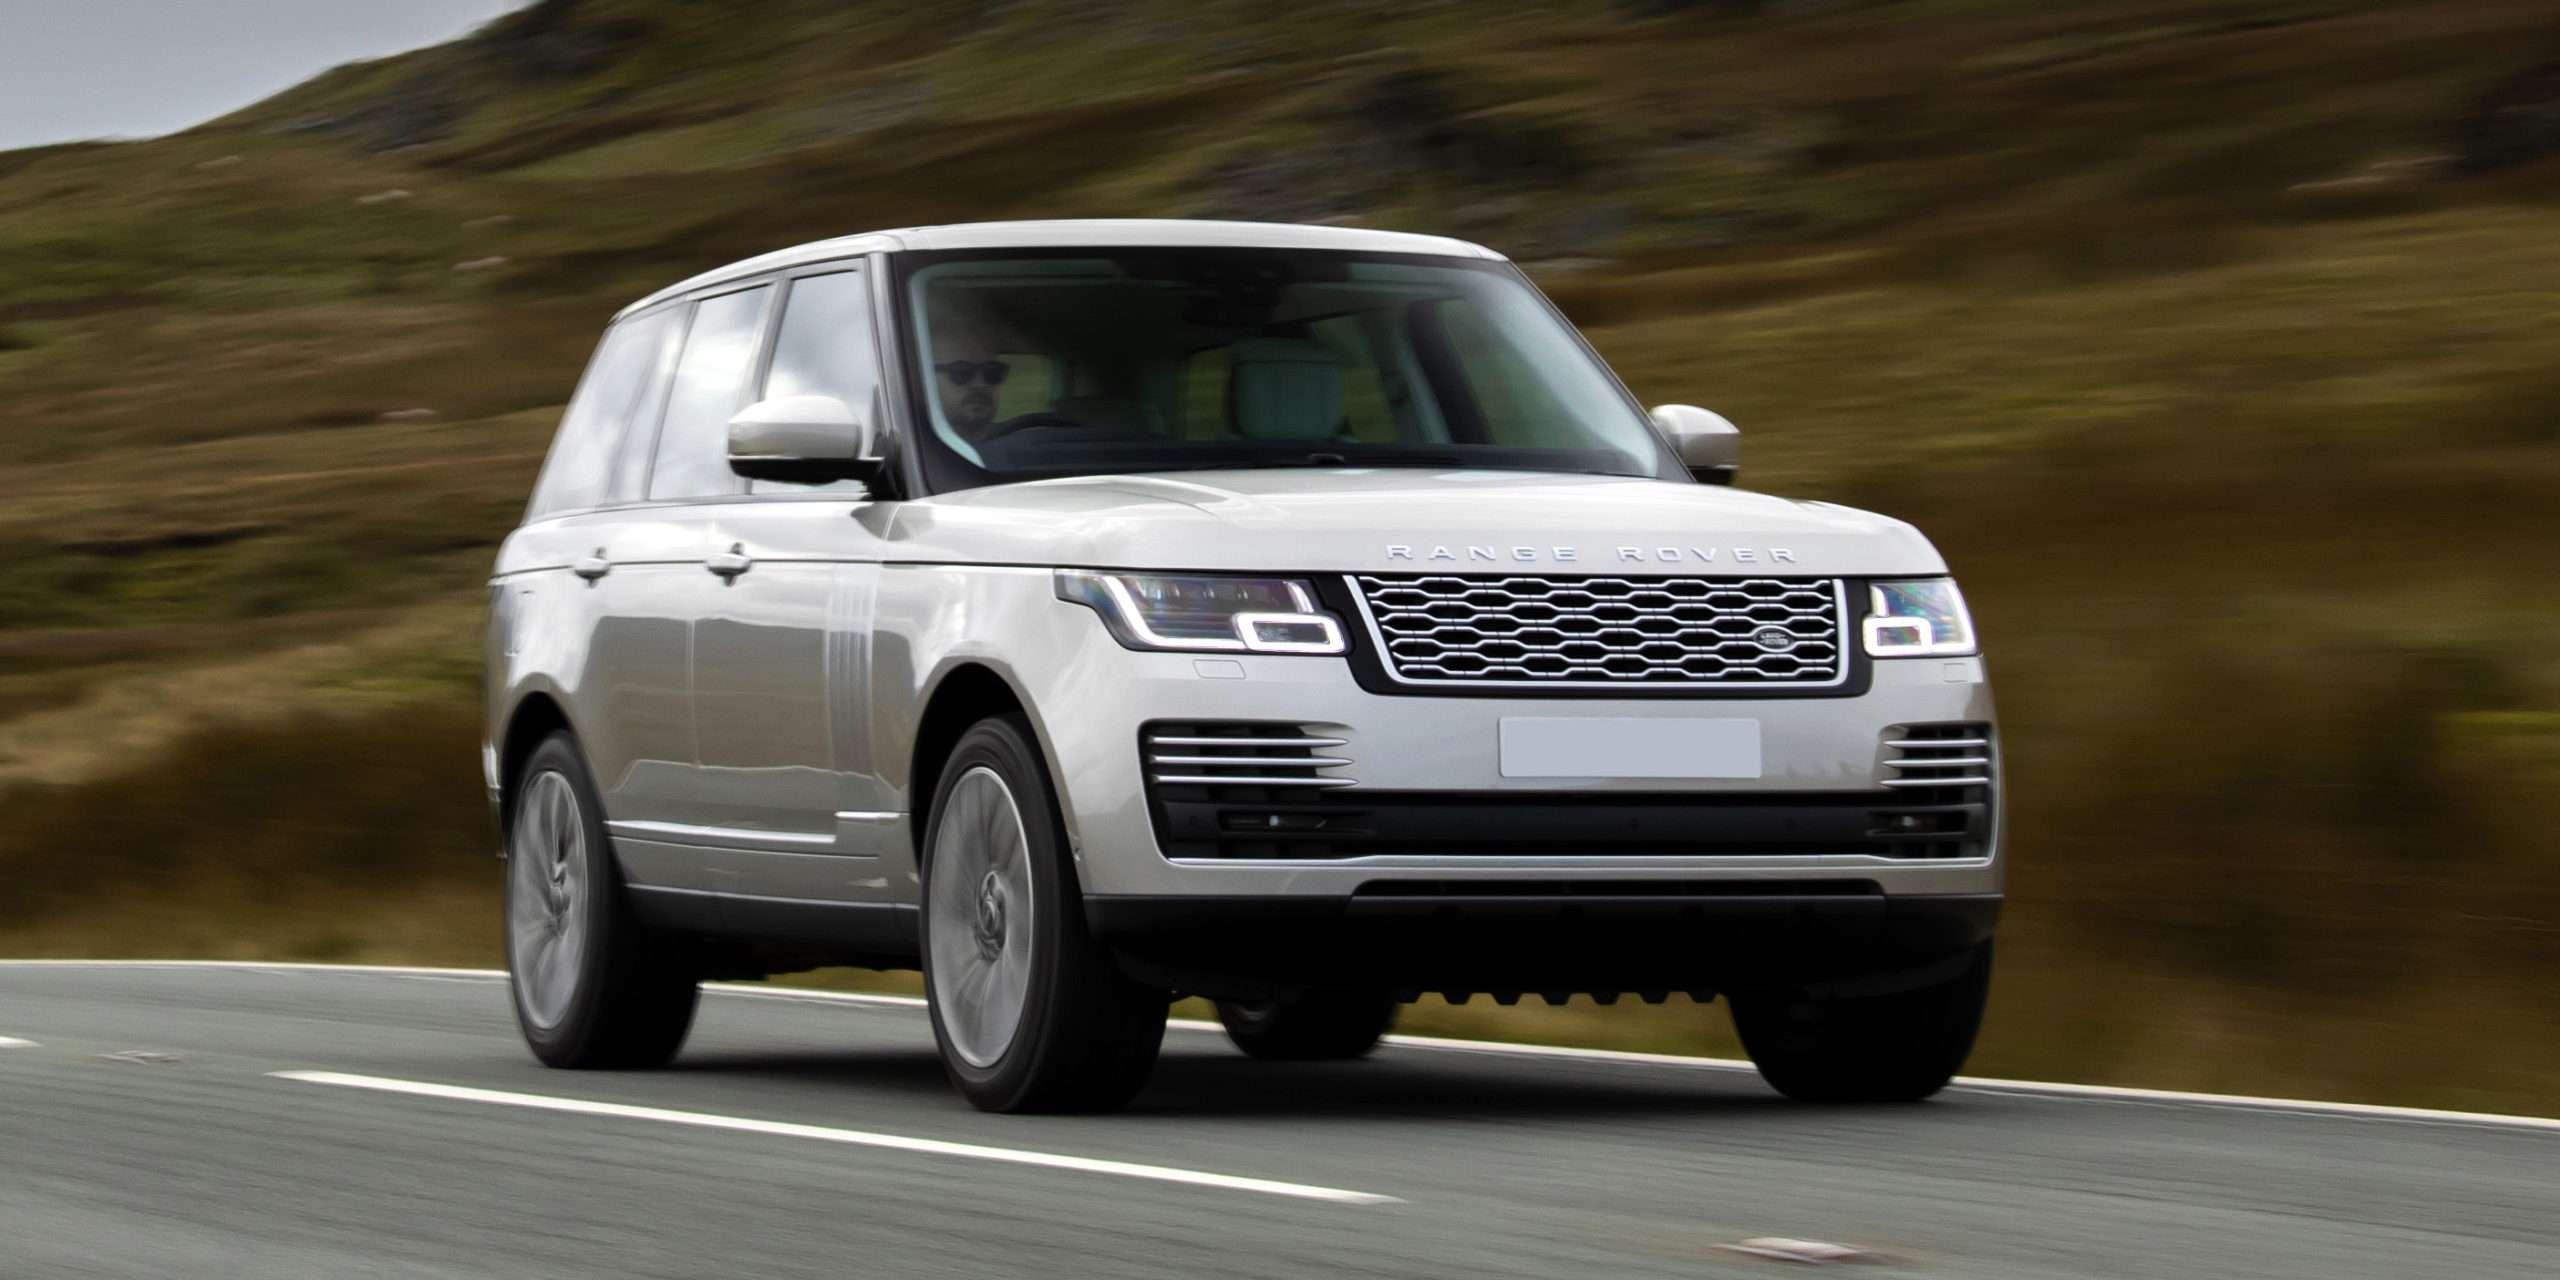 range-rover-luxury-suv